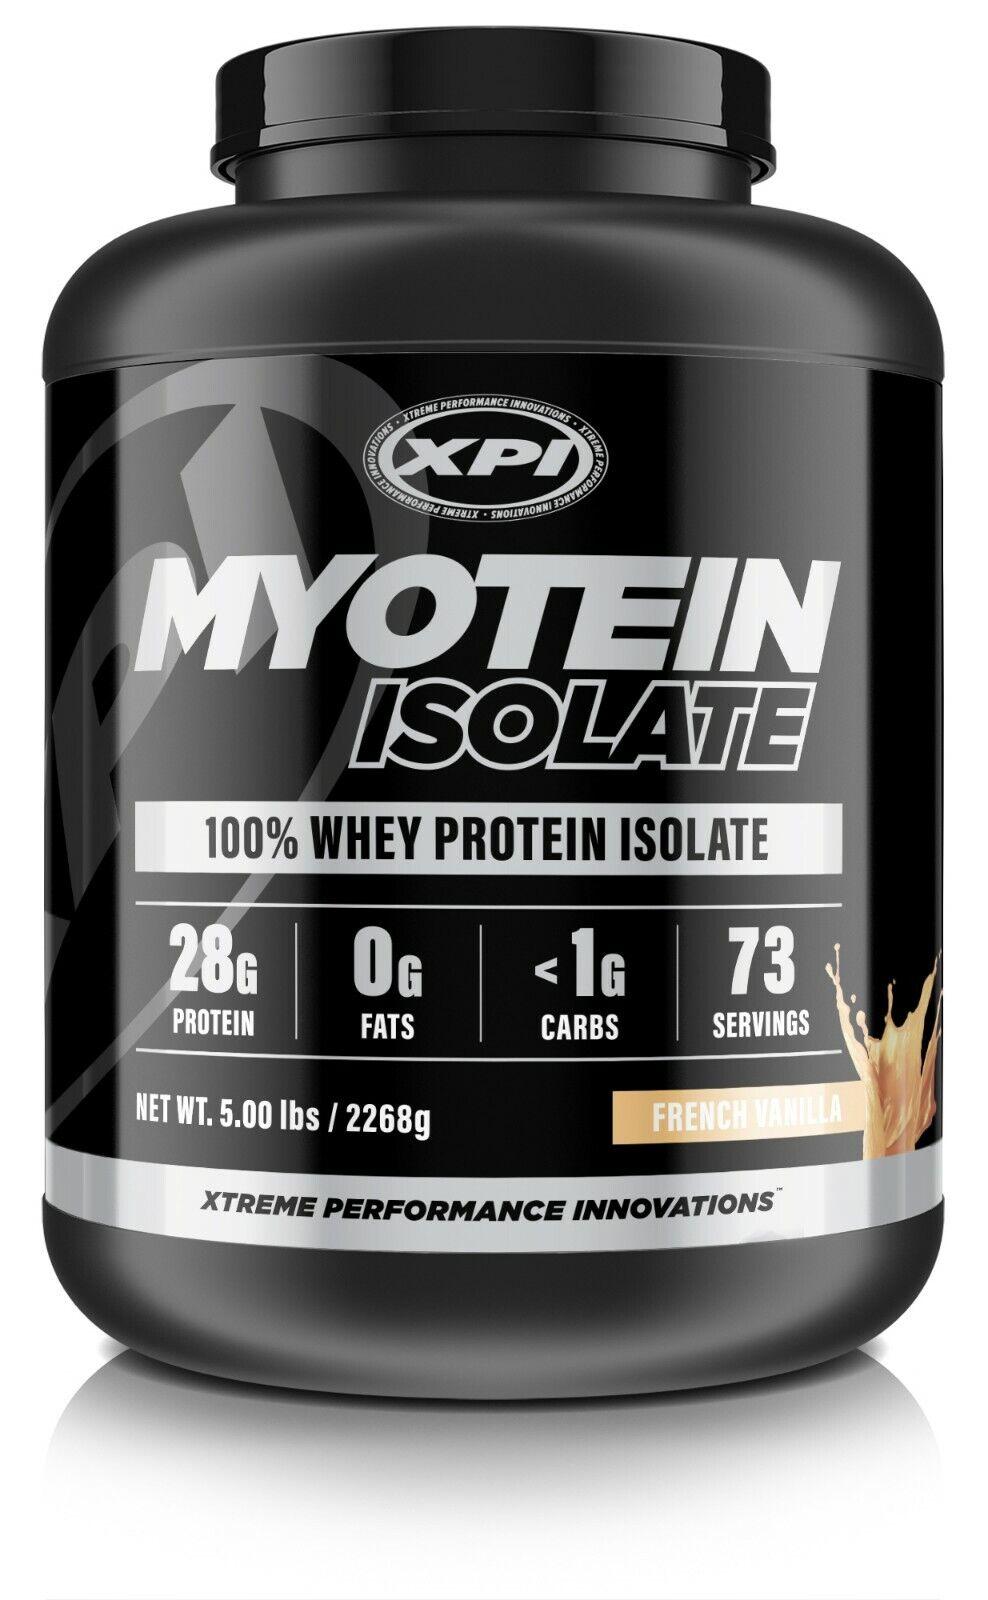 XPI Myotein Isolate Protein Powder 5LBS